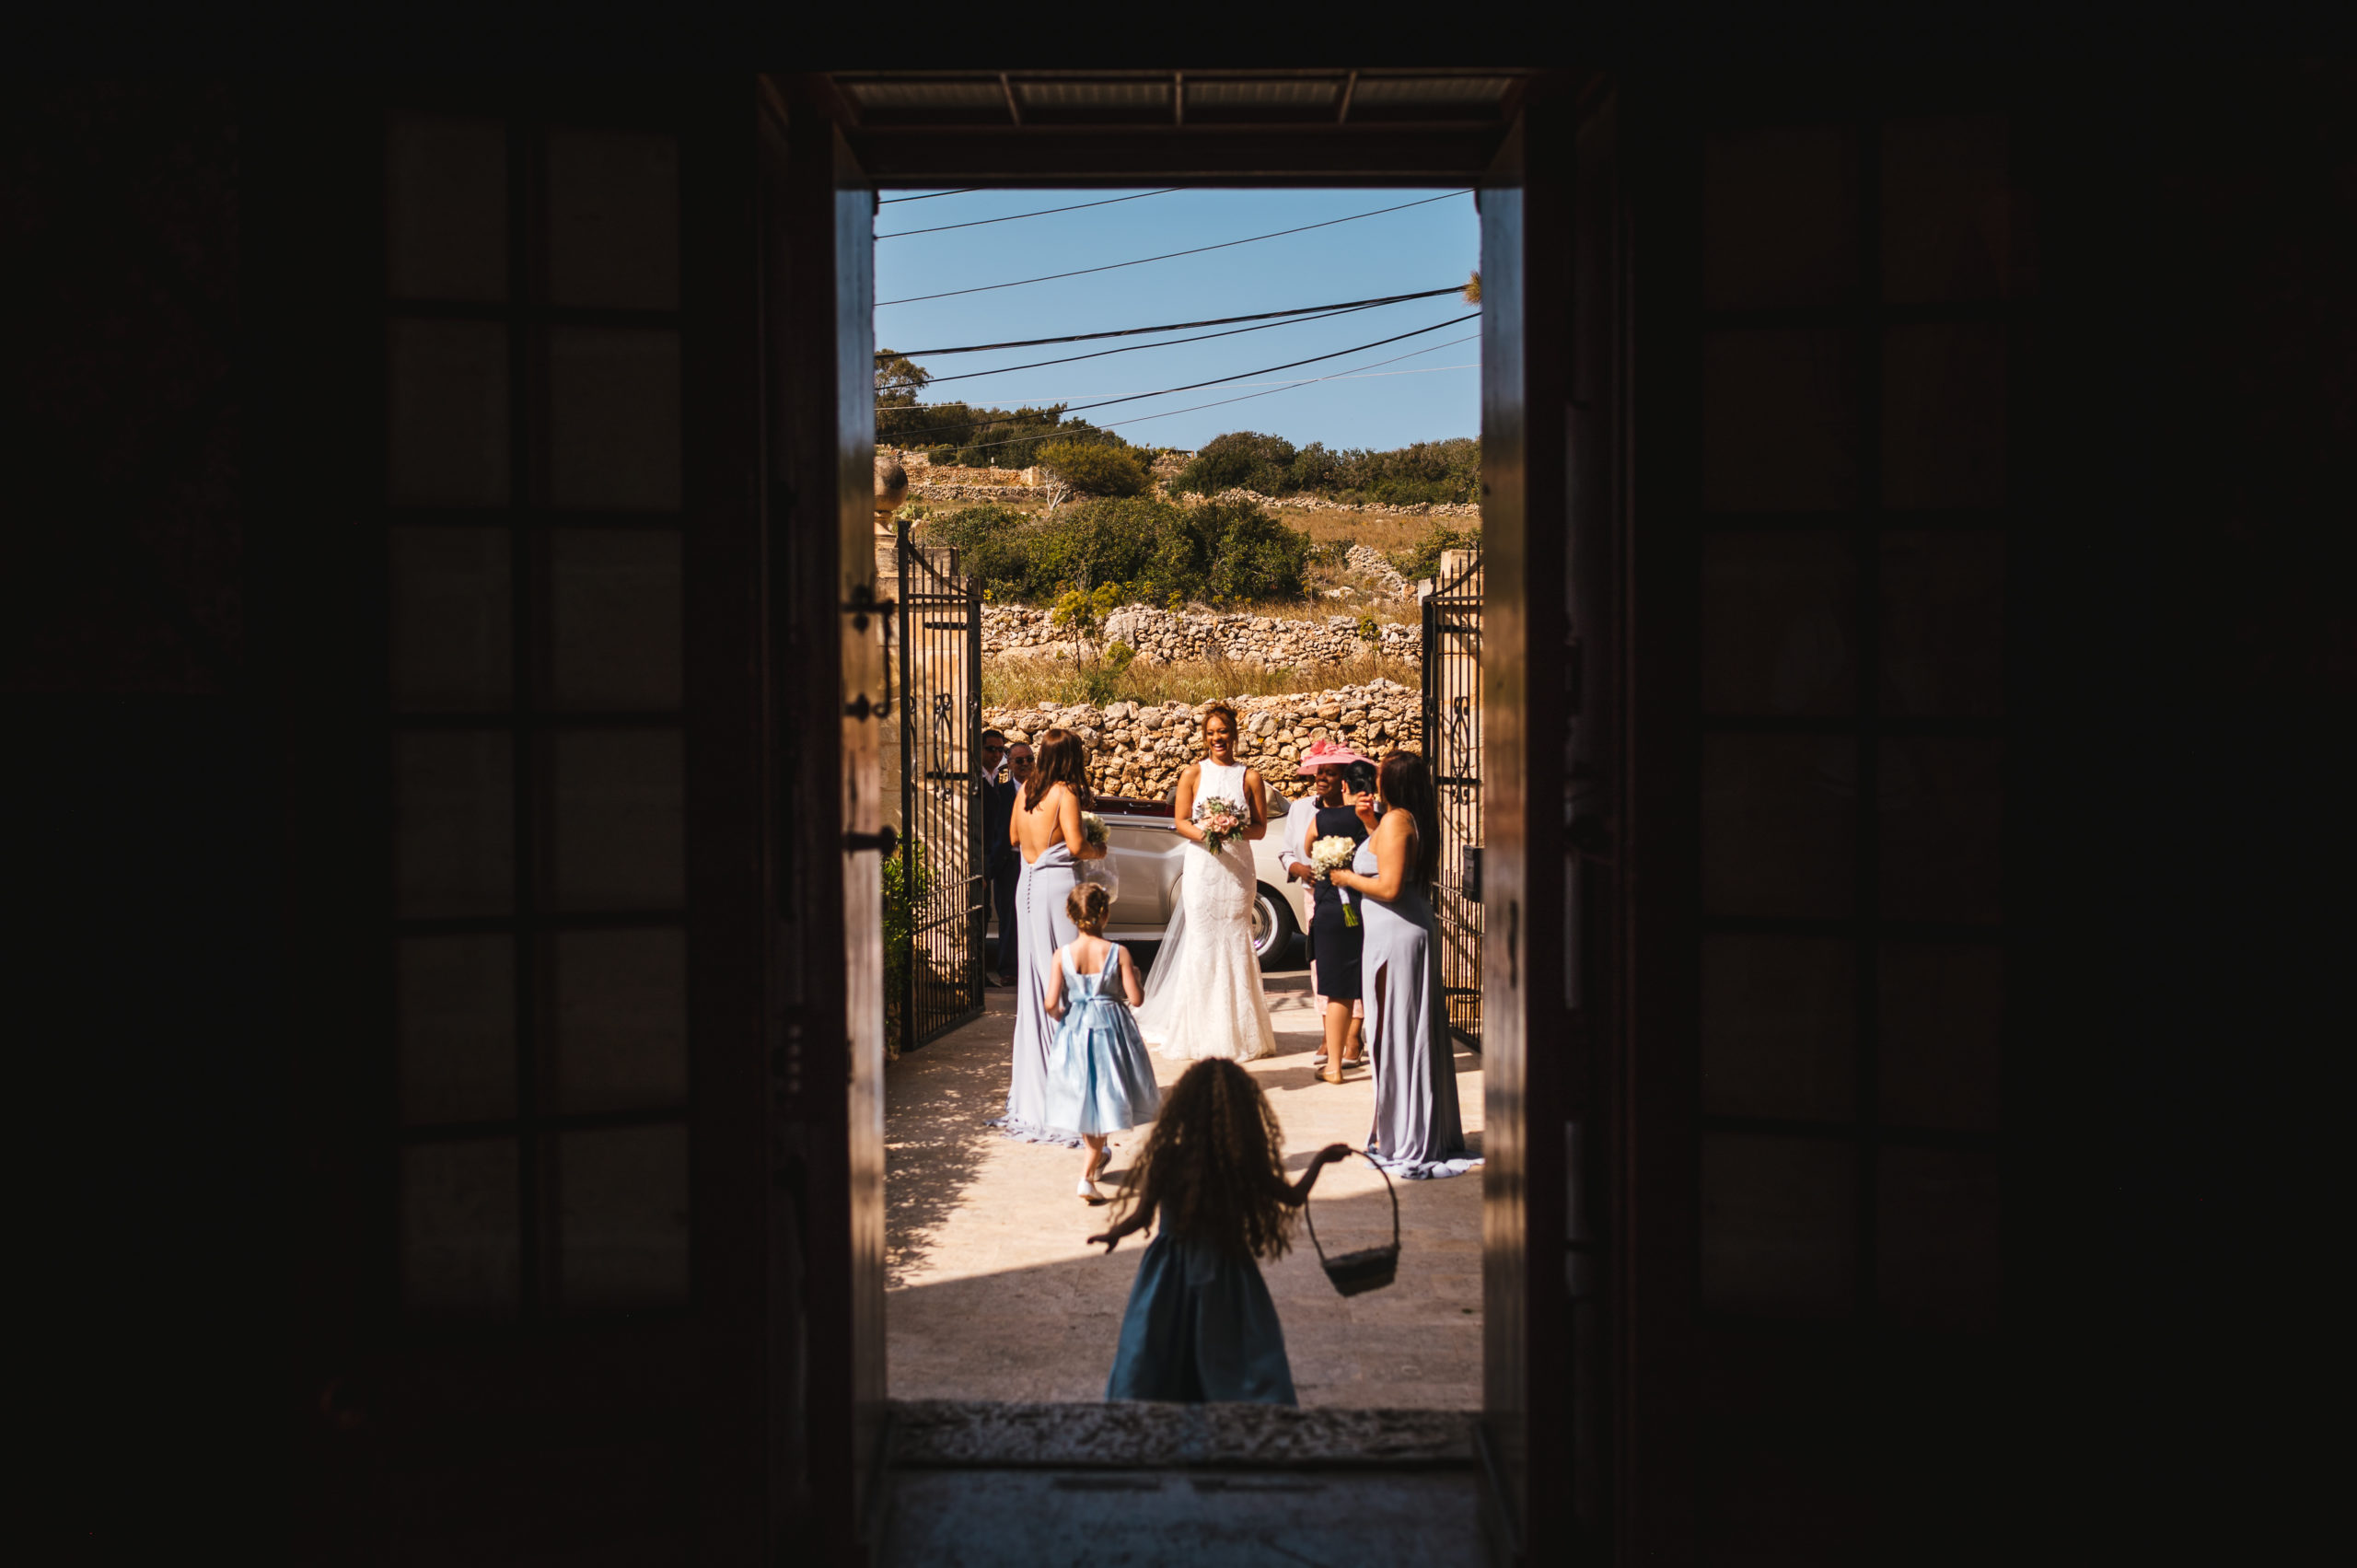 castello zammitello malta wedding